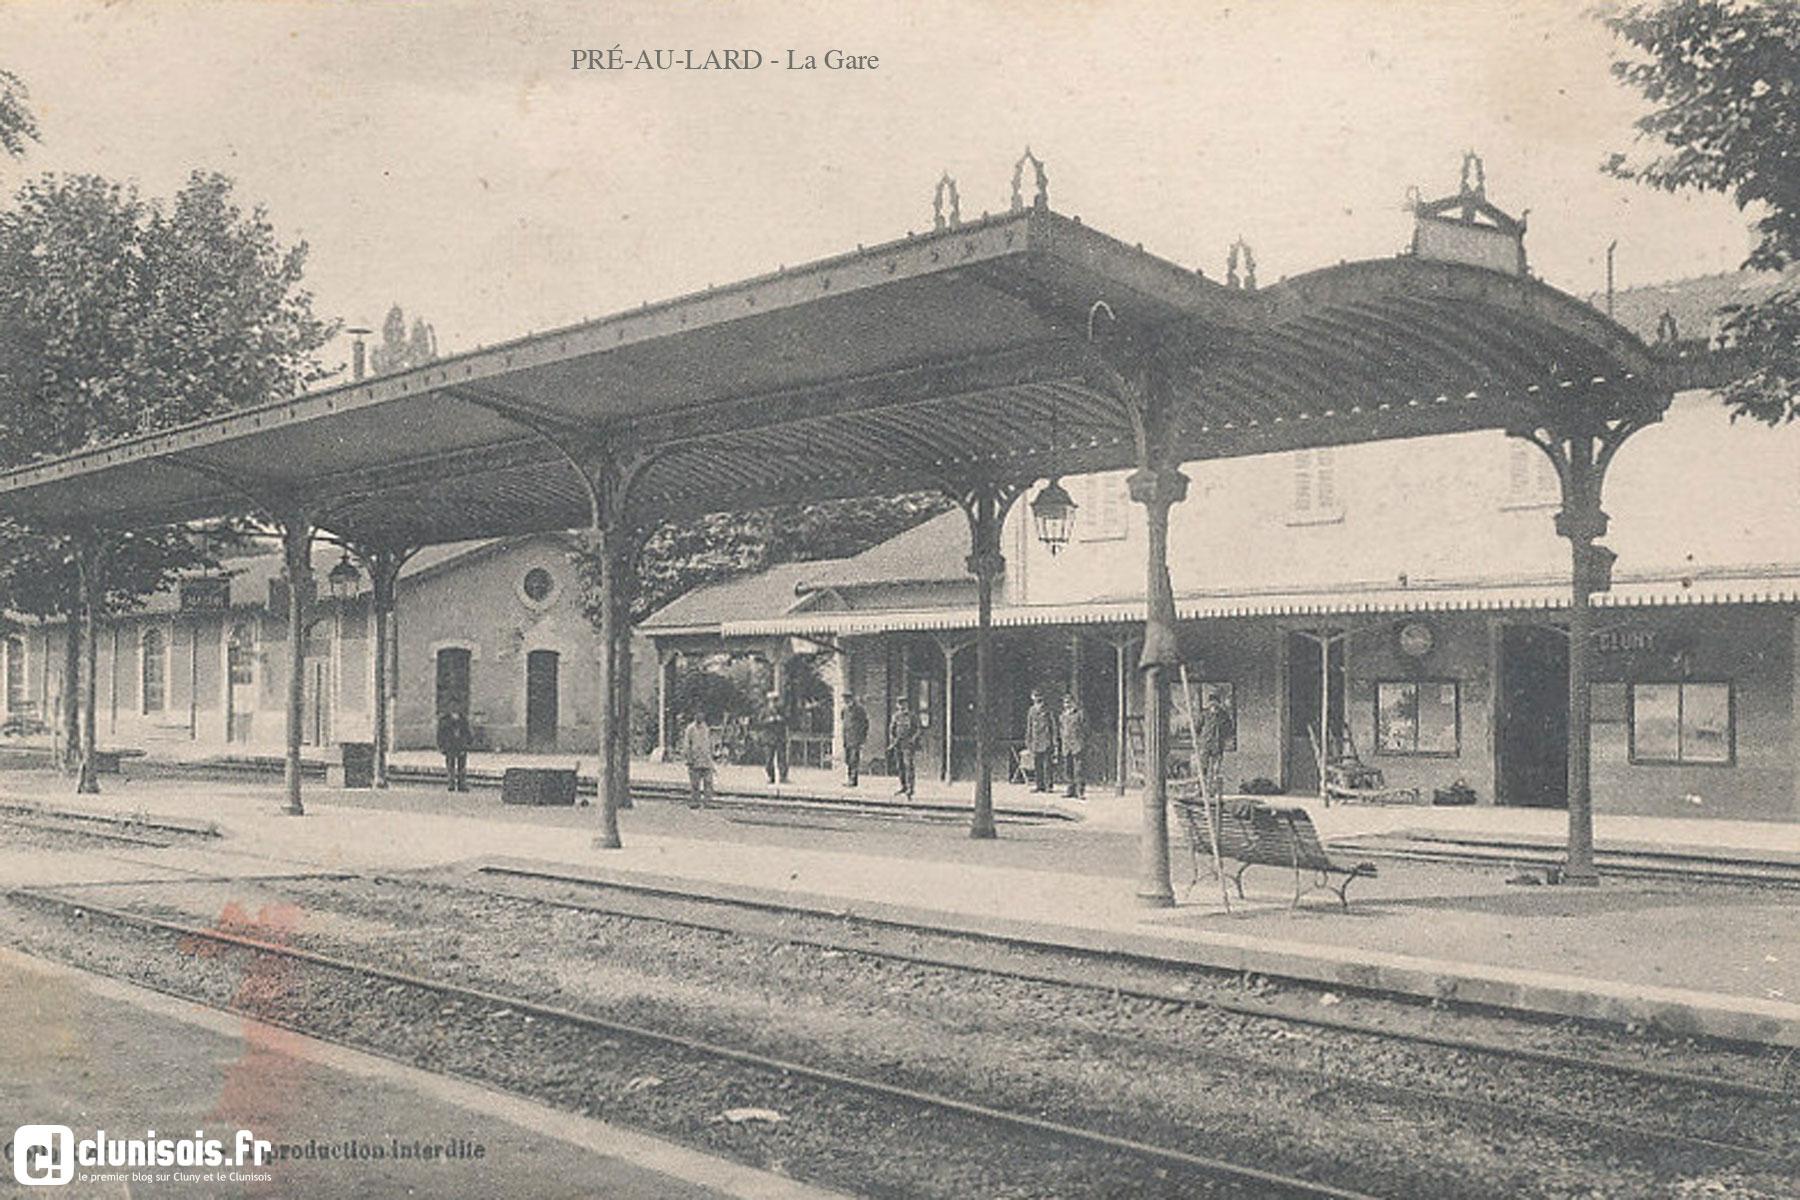 16-poudlard-existe-gare-pre-au-lard-clunisoisfr